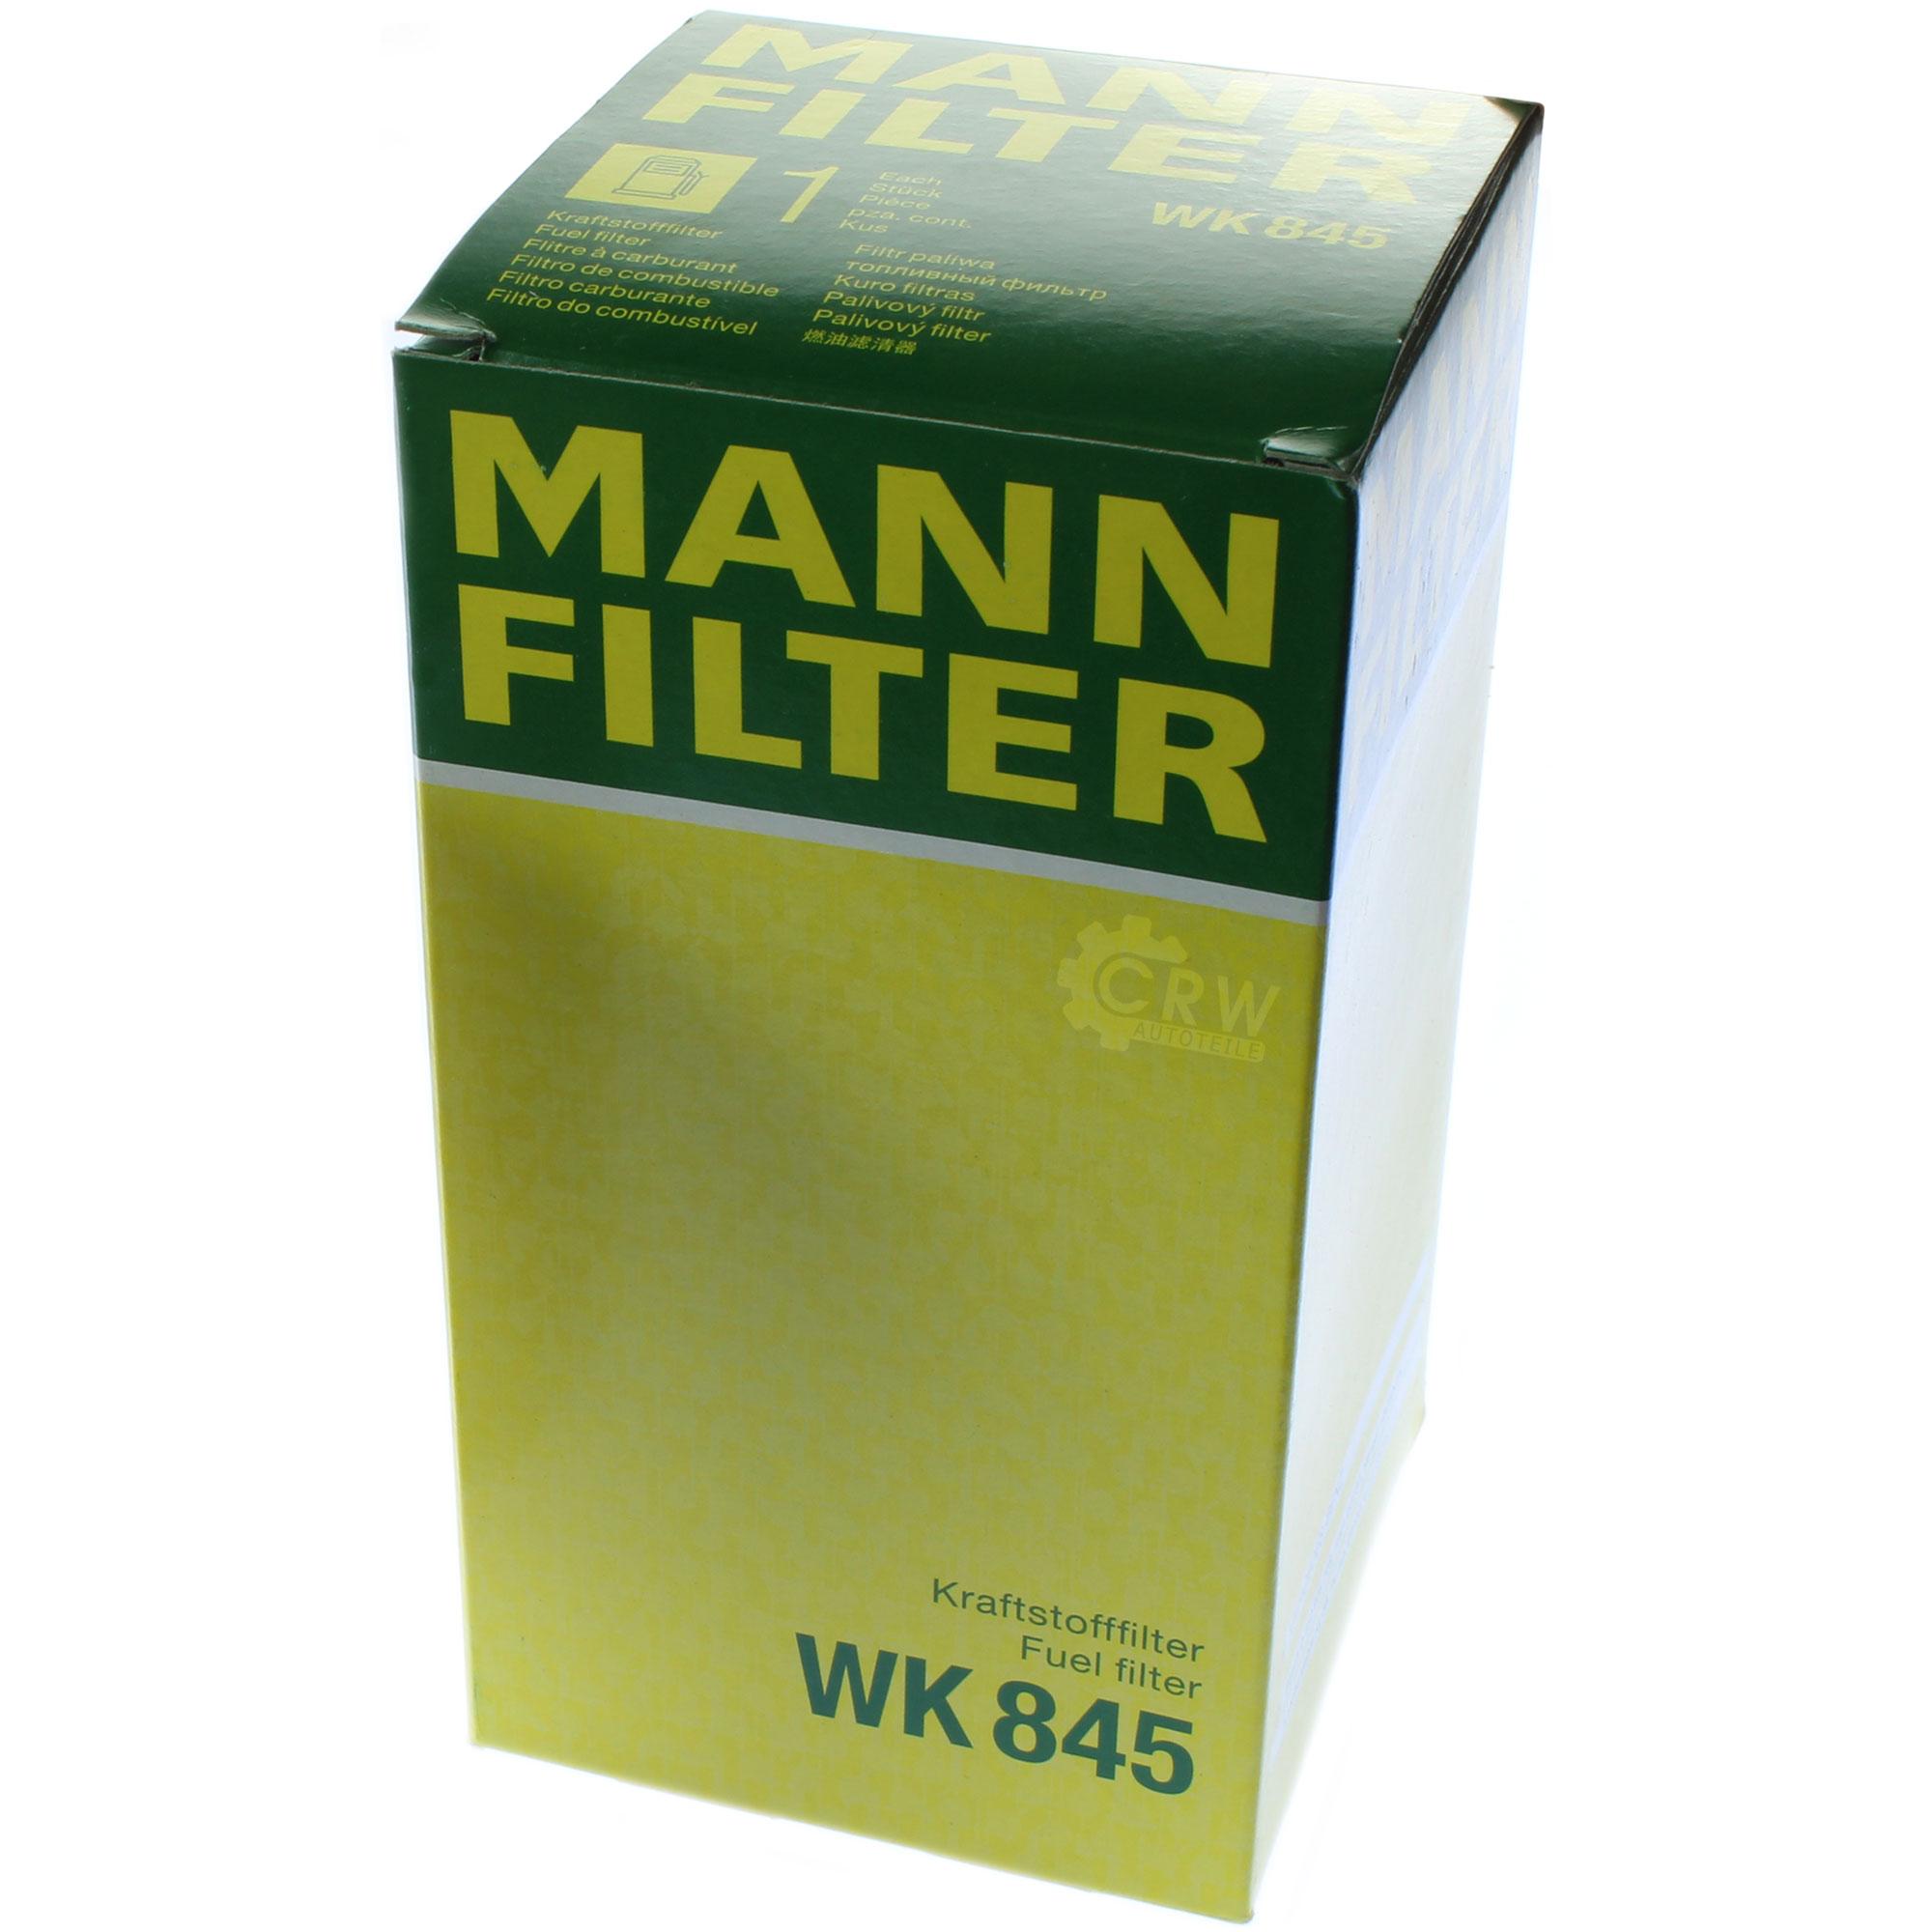 Motor-Ol-8L-MANNOL-Classic-10W-40-MANN-FILTER-Mercedes-Benz-Stufenheck-W124 Indexbild 10